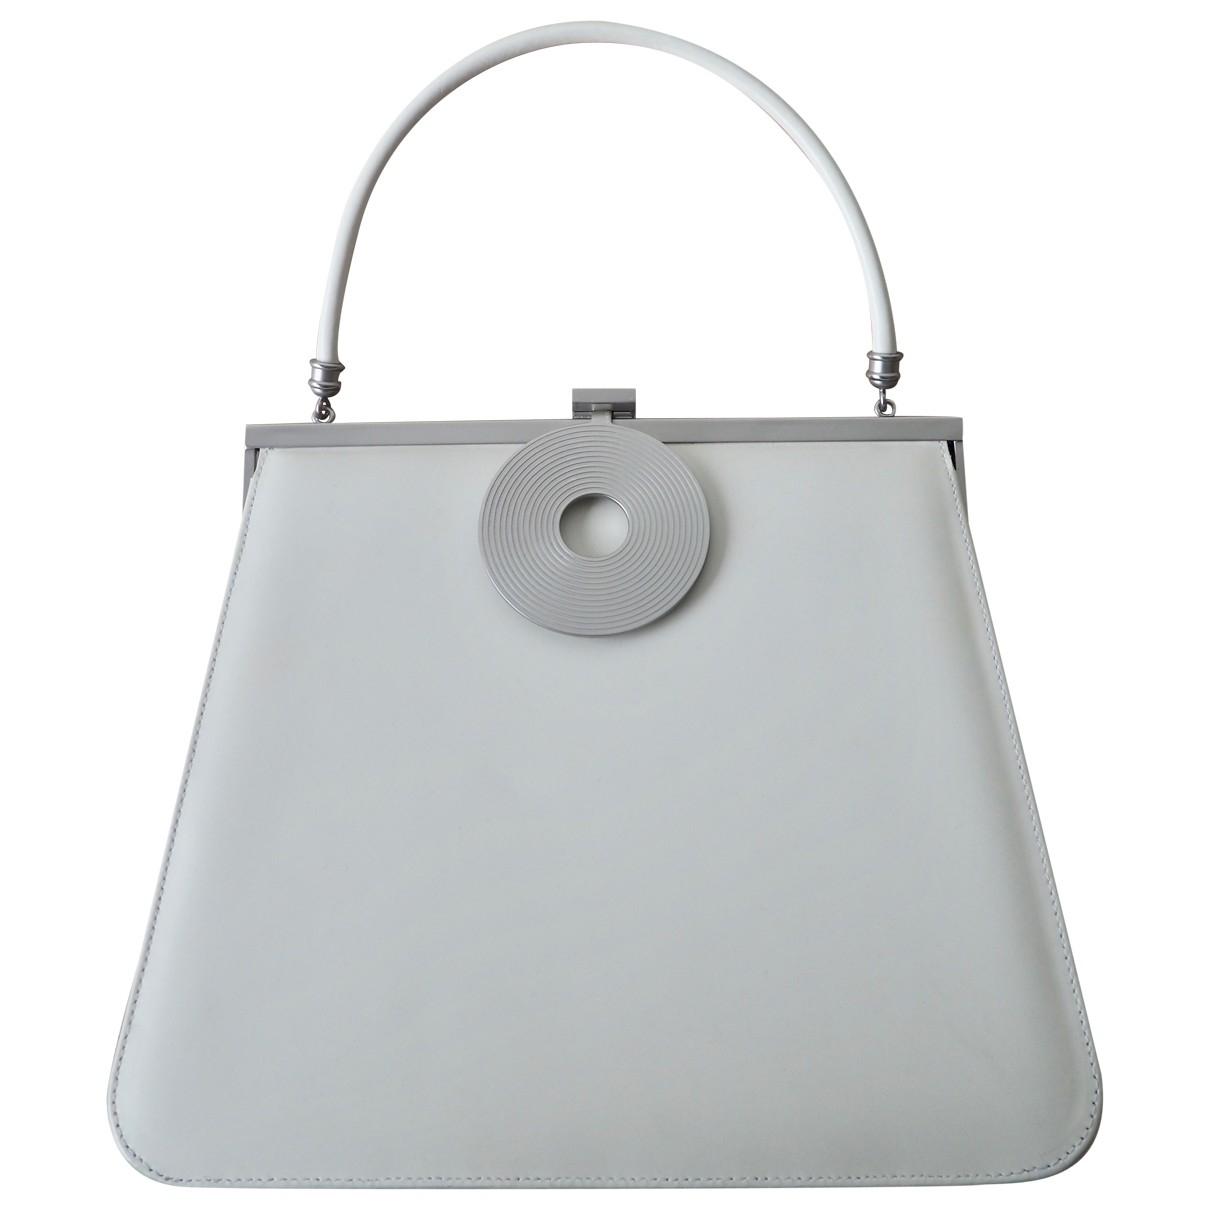 Dorateymur \N White Leather handbag for Women \N